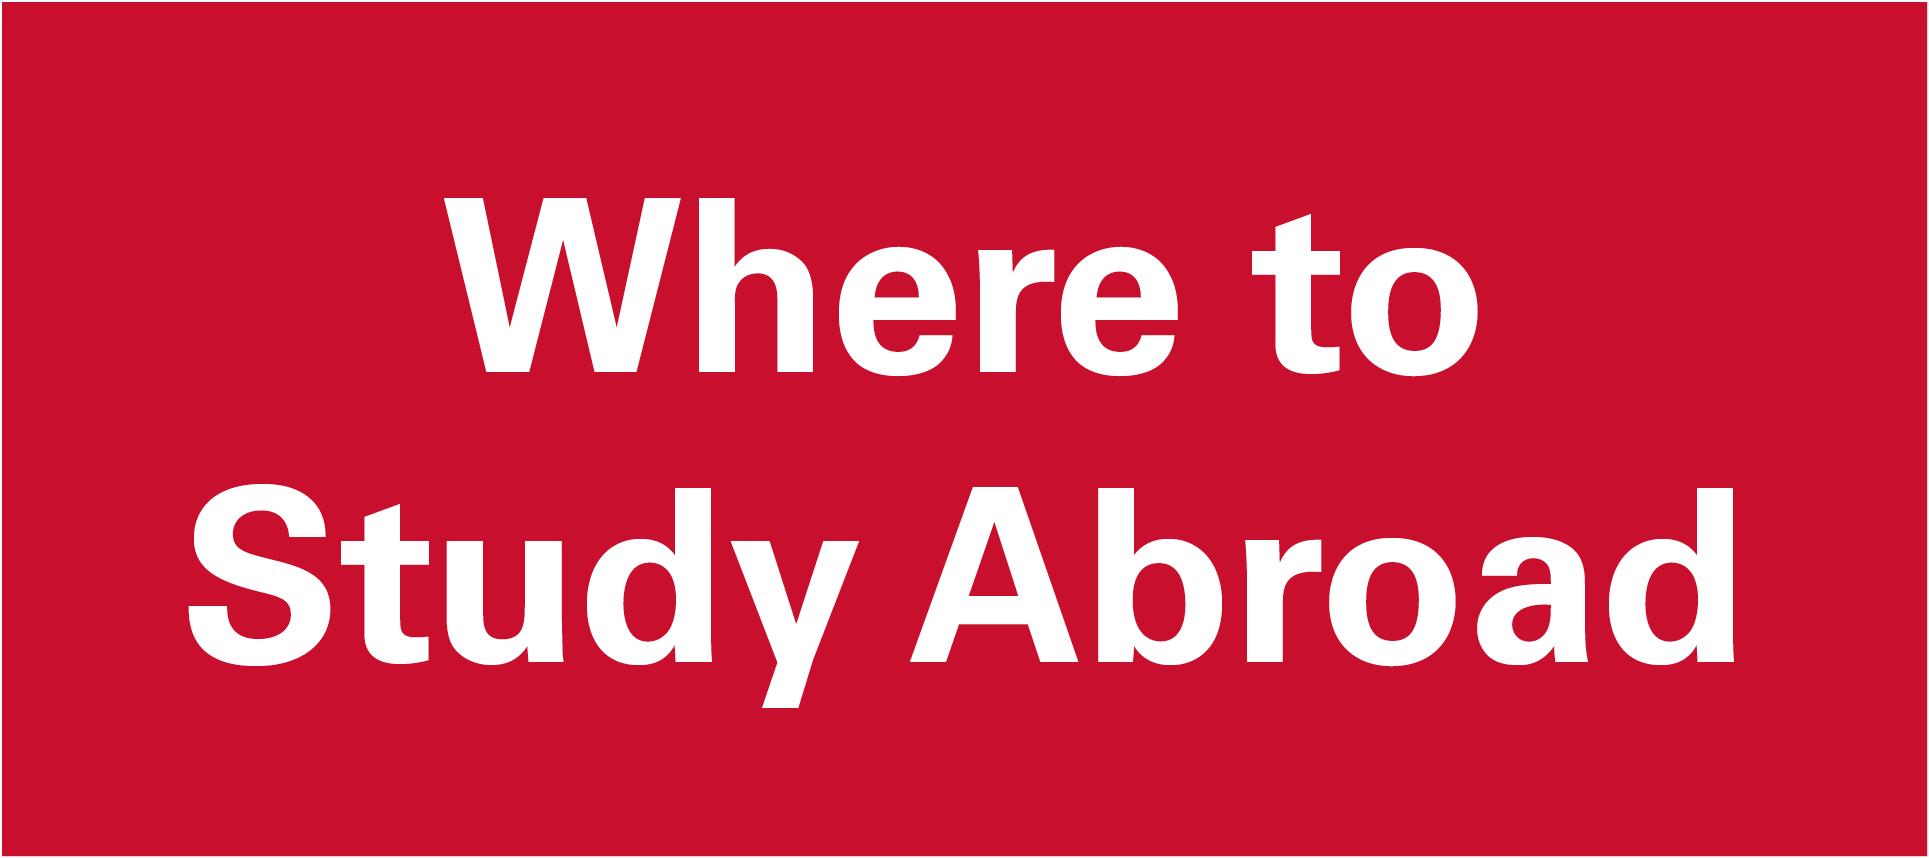 Study Abroad WHERE